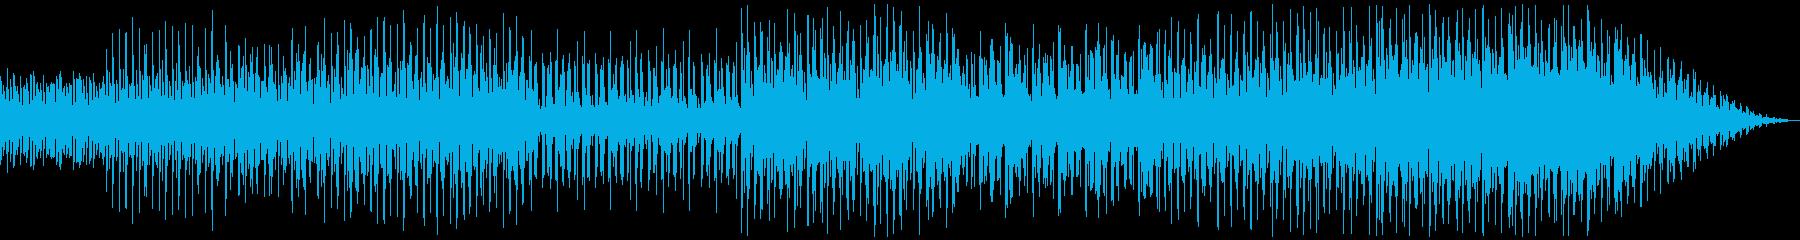 SF 宇宙人 調査 警備 テクノビートの再生済みの波形